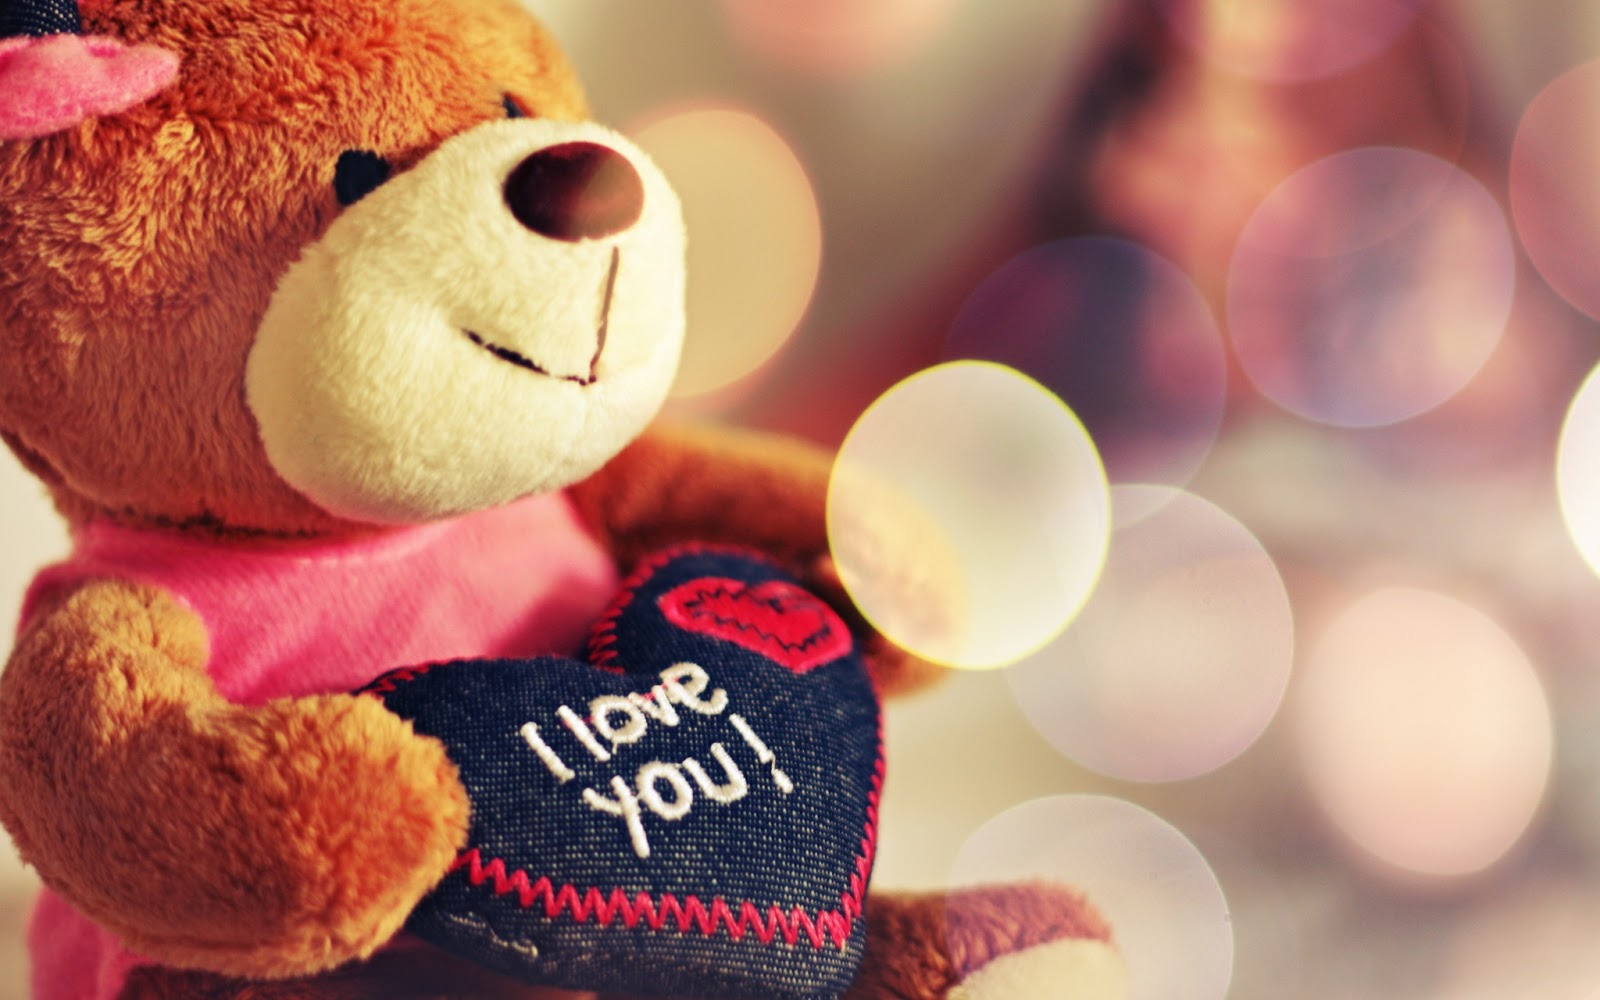 http://4.bp.blogspot.com/-Yp5R2eRVKZo/UQc2o8bQU_I/AAAAAAAAF_Y/UwUo8LG9h-o/s1600/i_love_you_teddy_bear-wide.jpg